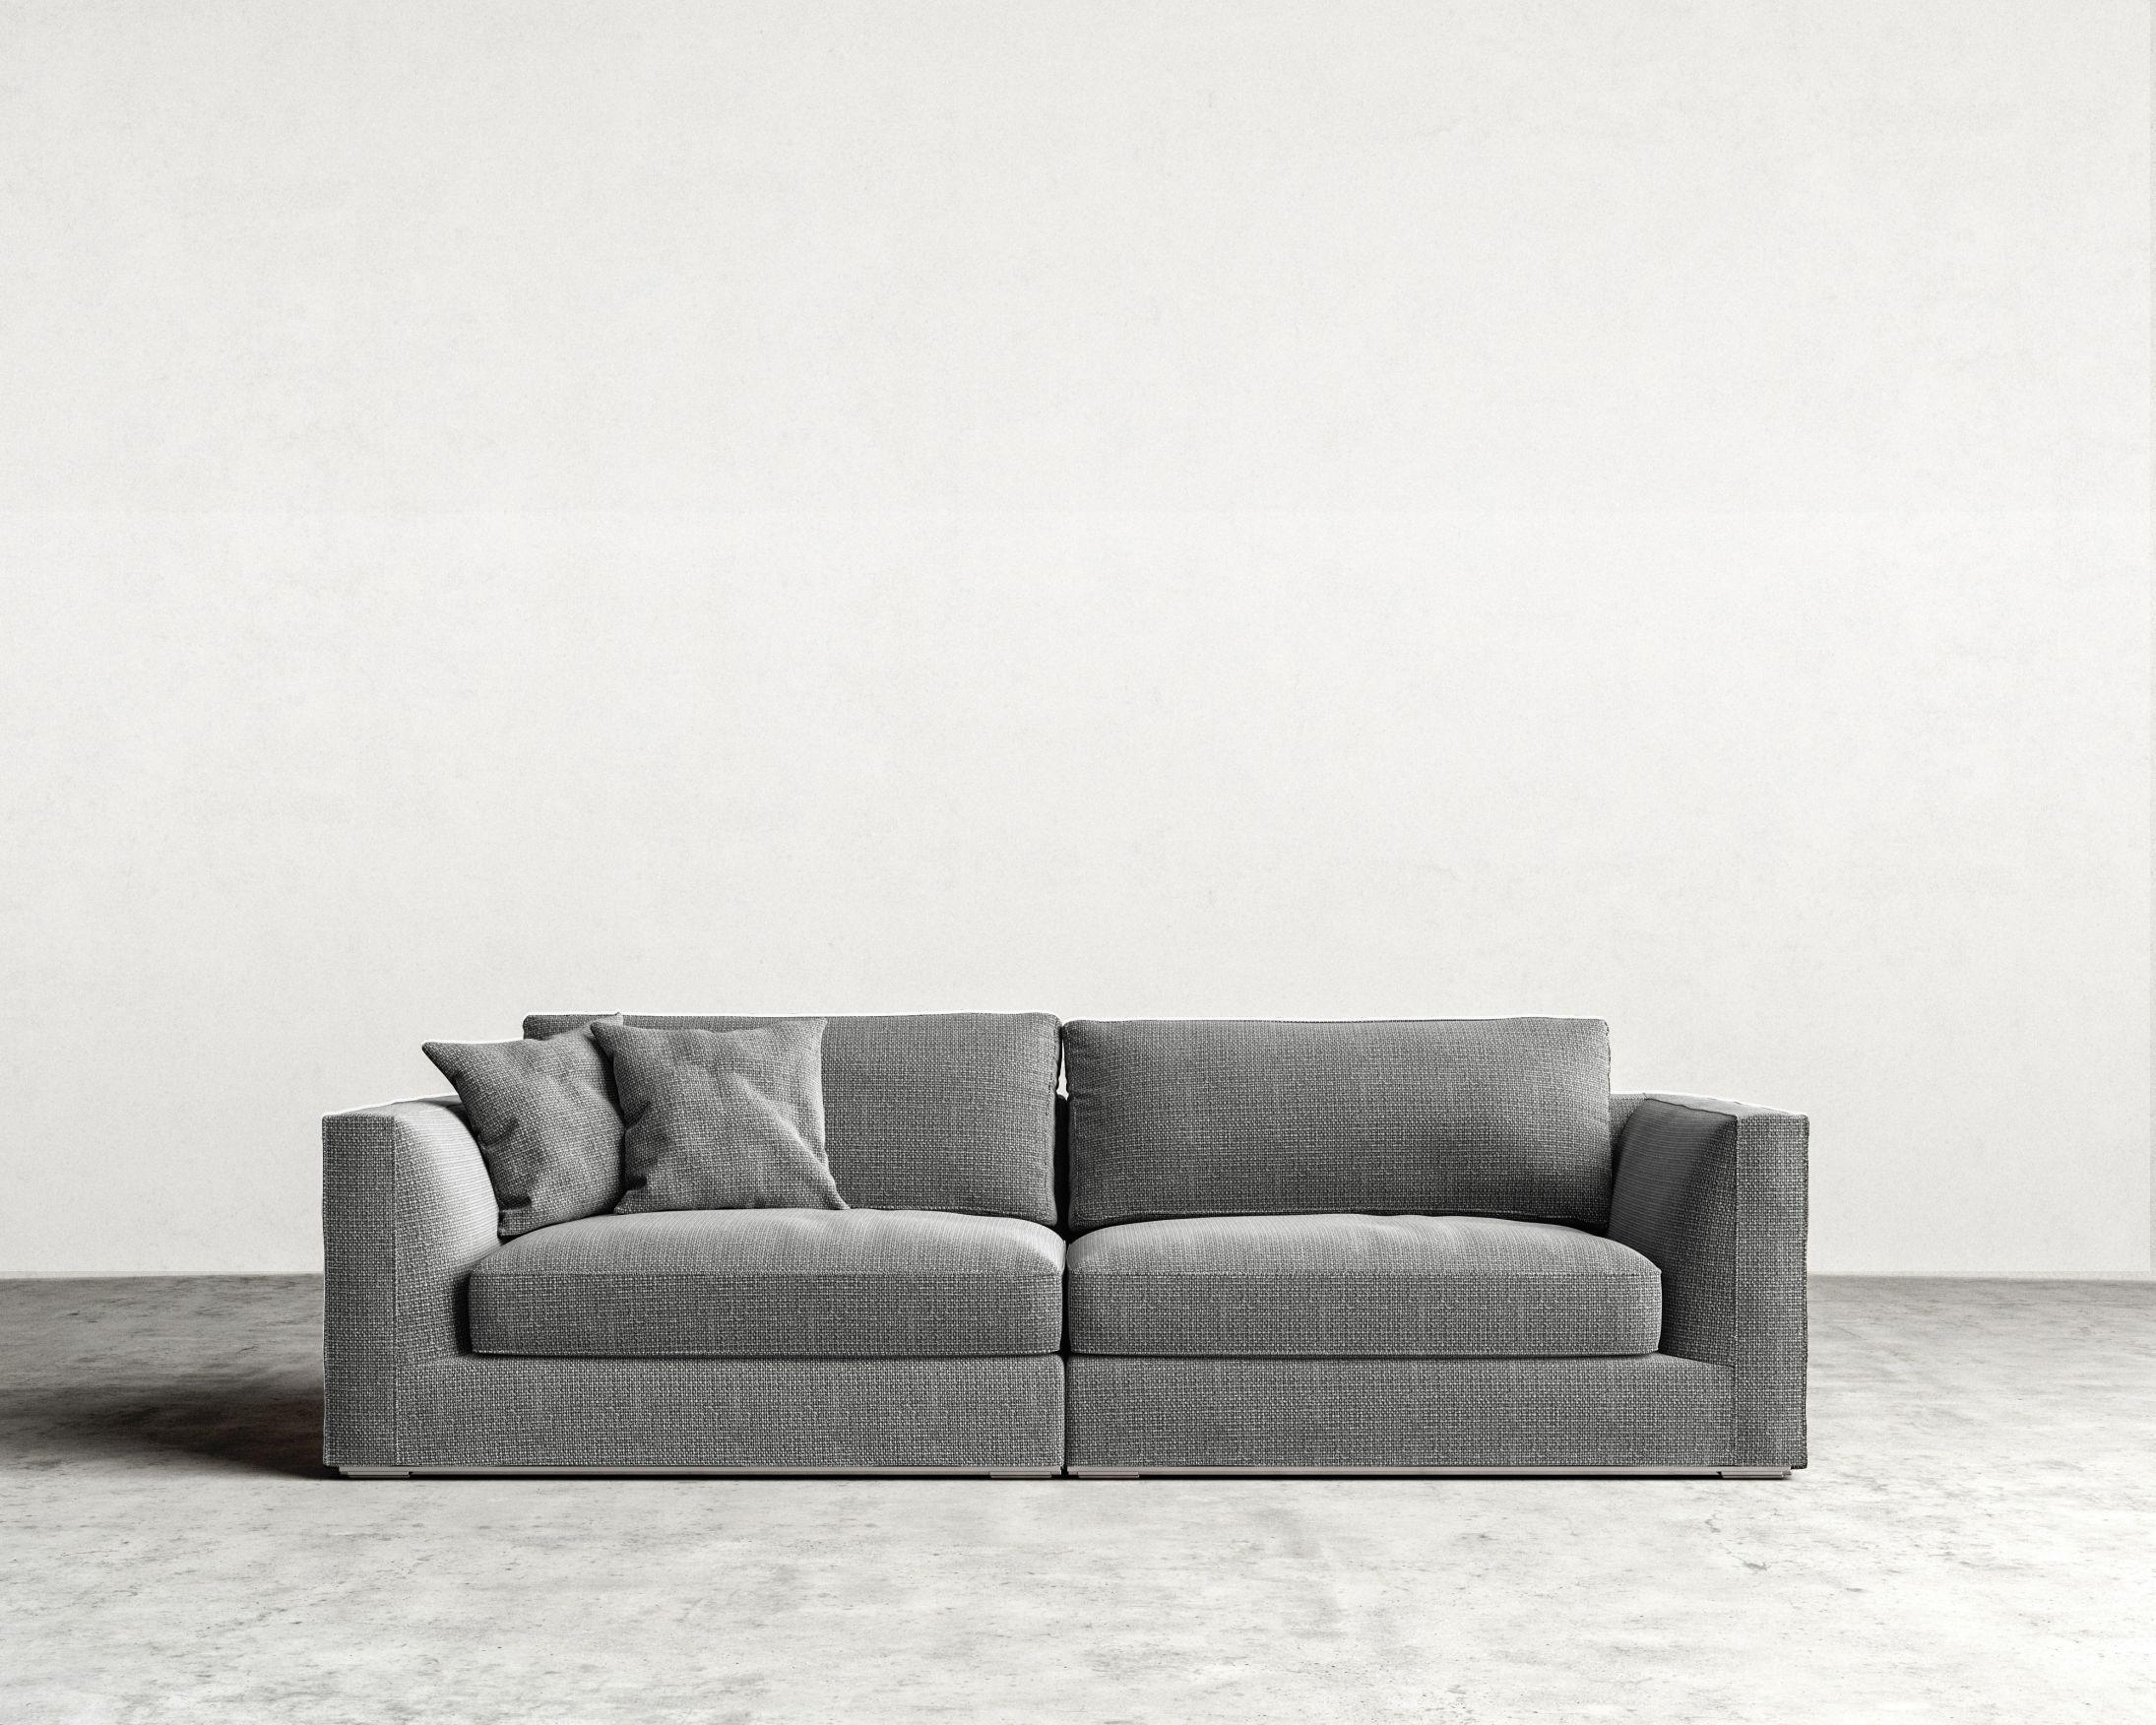 Milo Corner Sofa Groupon Review Rattan Modular Set Garden Furniture Dfs And Cuddle Chair In Tiverton Devon